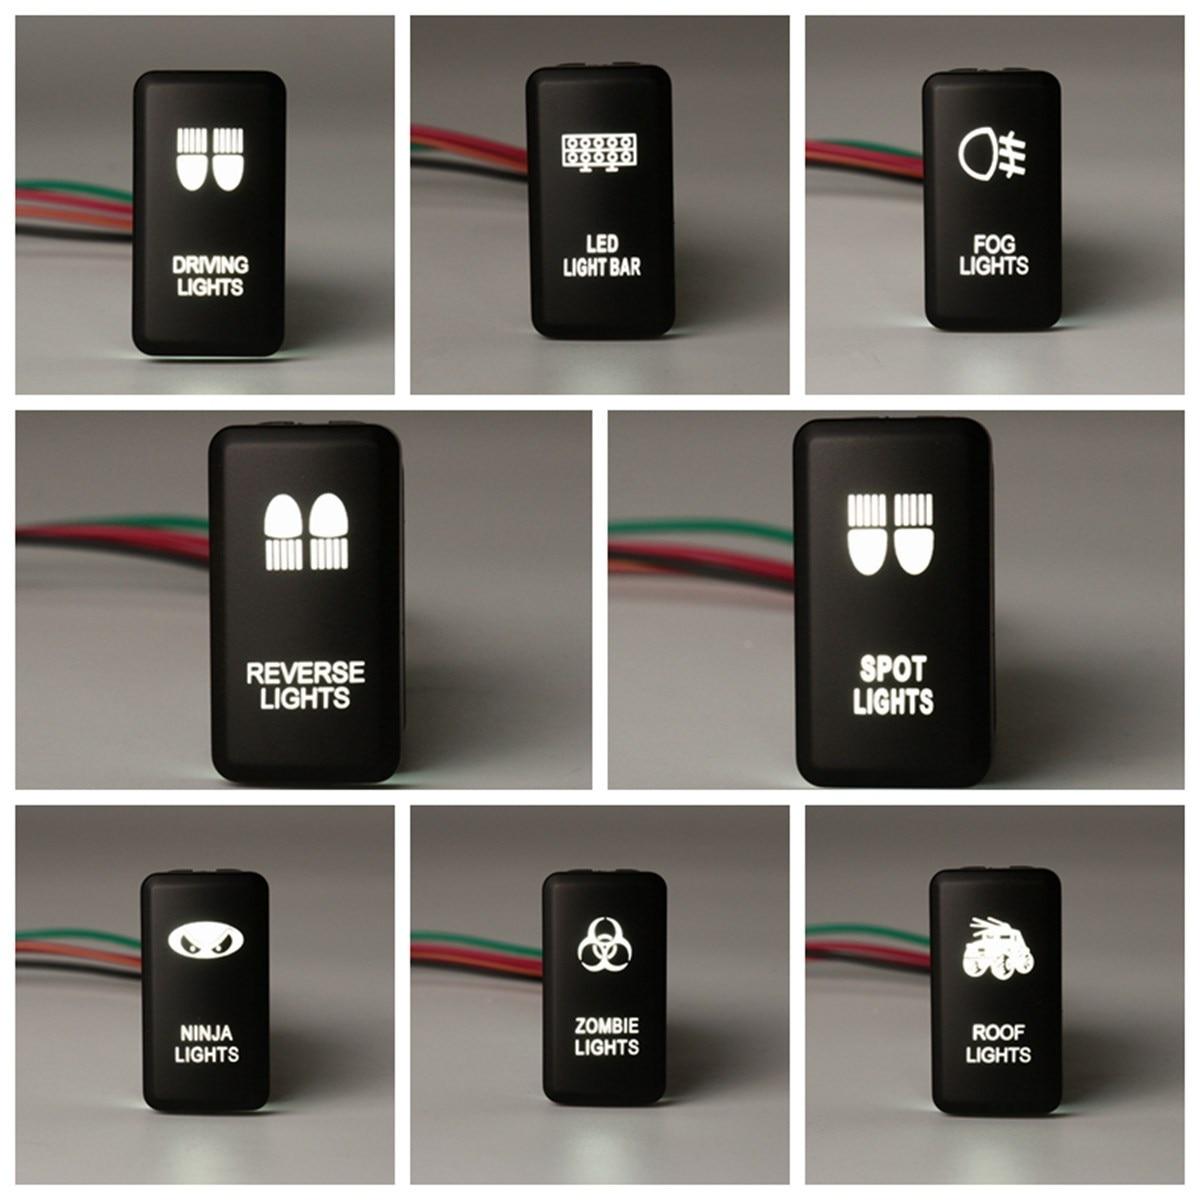 1x Dual White ON/OFF LED Light Bar Push Switch For Toyota Landcruiser Hilux Prado 120 /FJ CRUISE